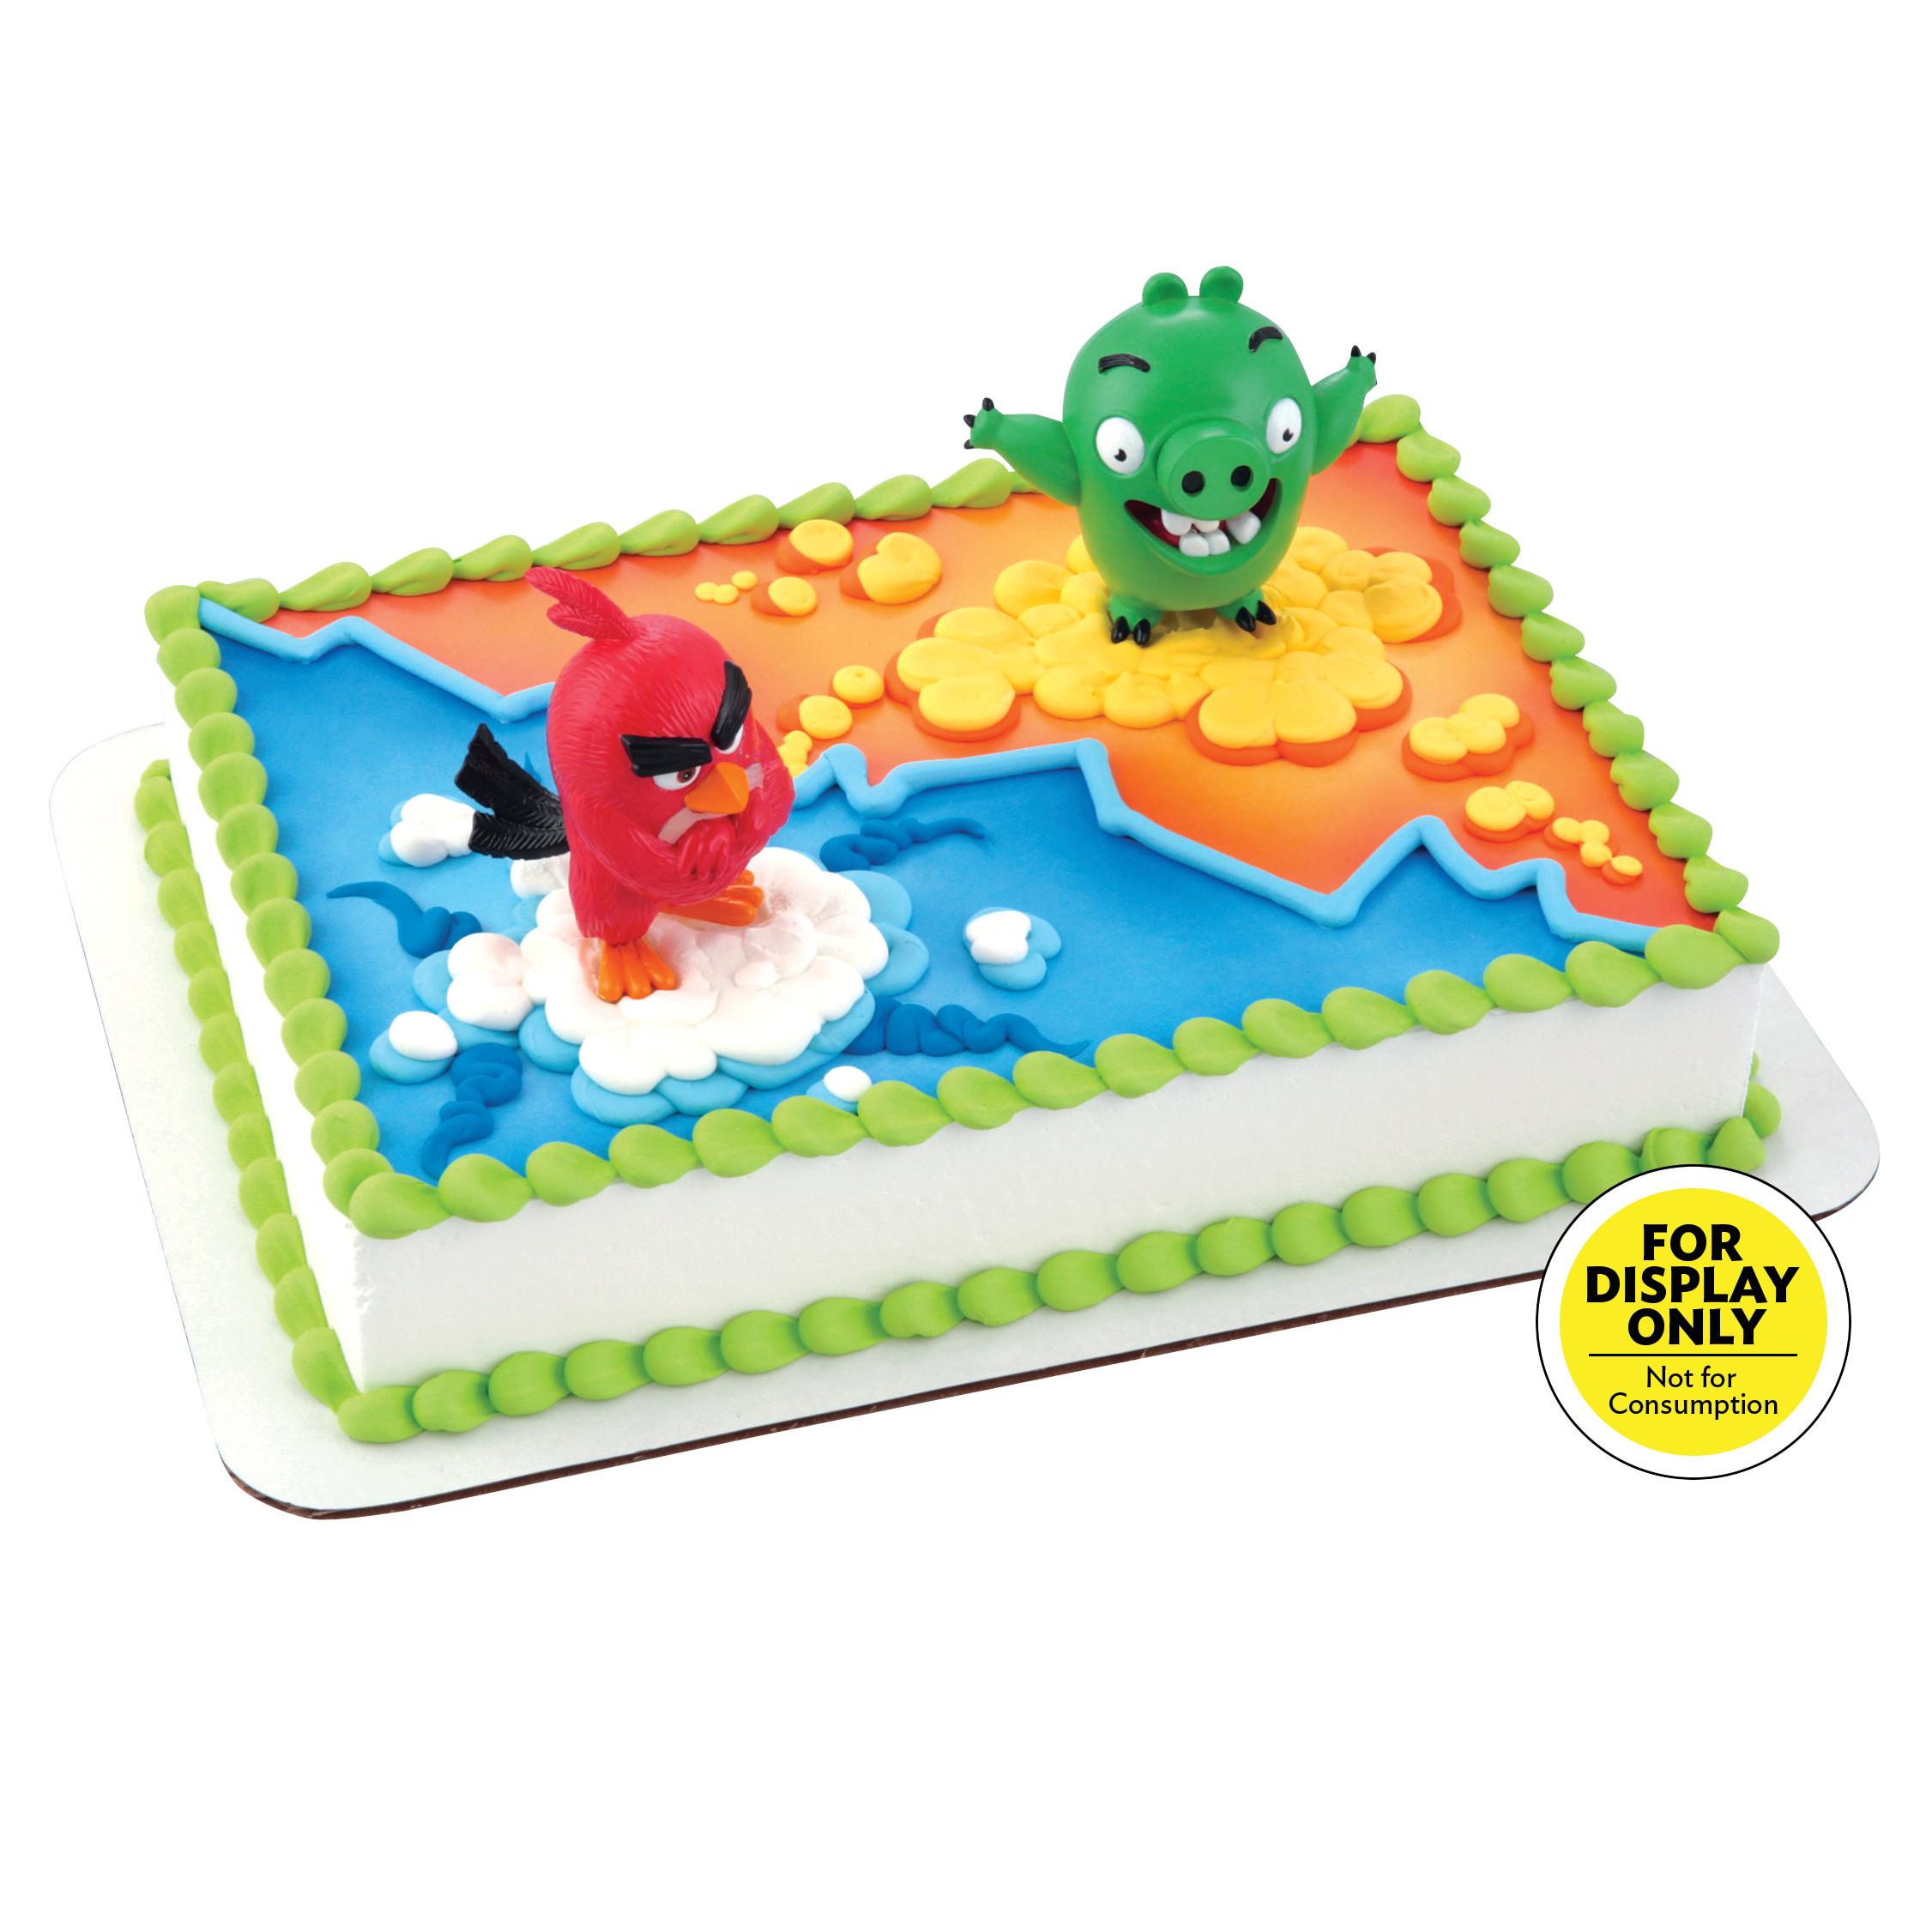 Angry Birds Red Bird Amp Bad Piggy Decodisplay 174 Cake Decopac